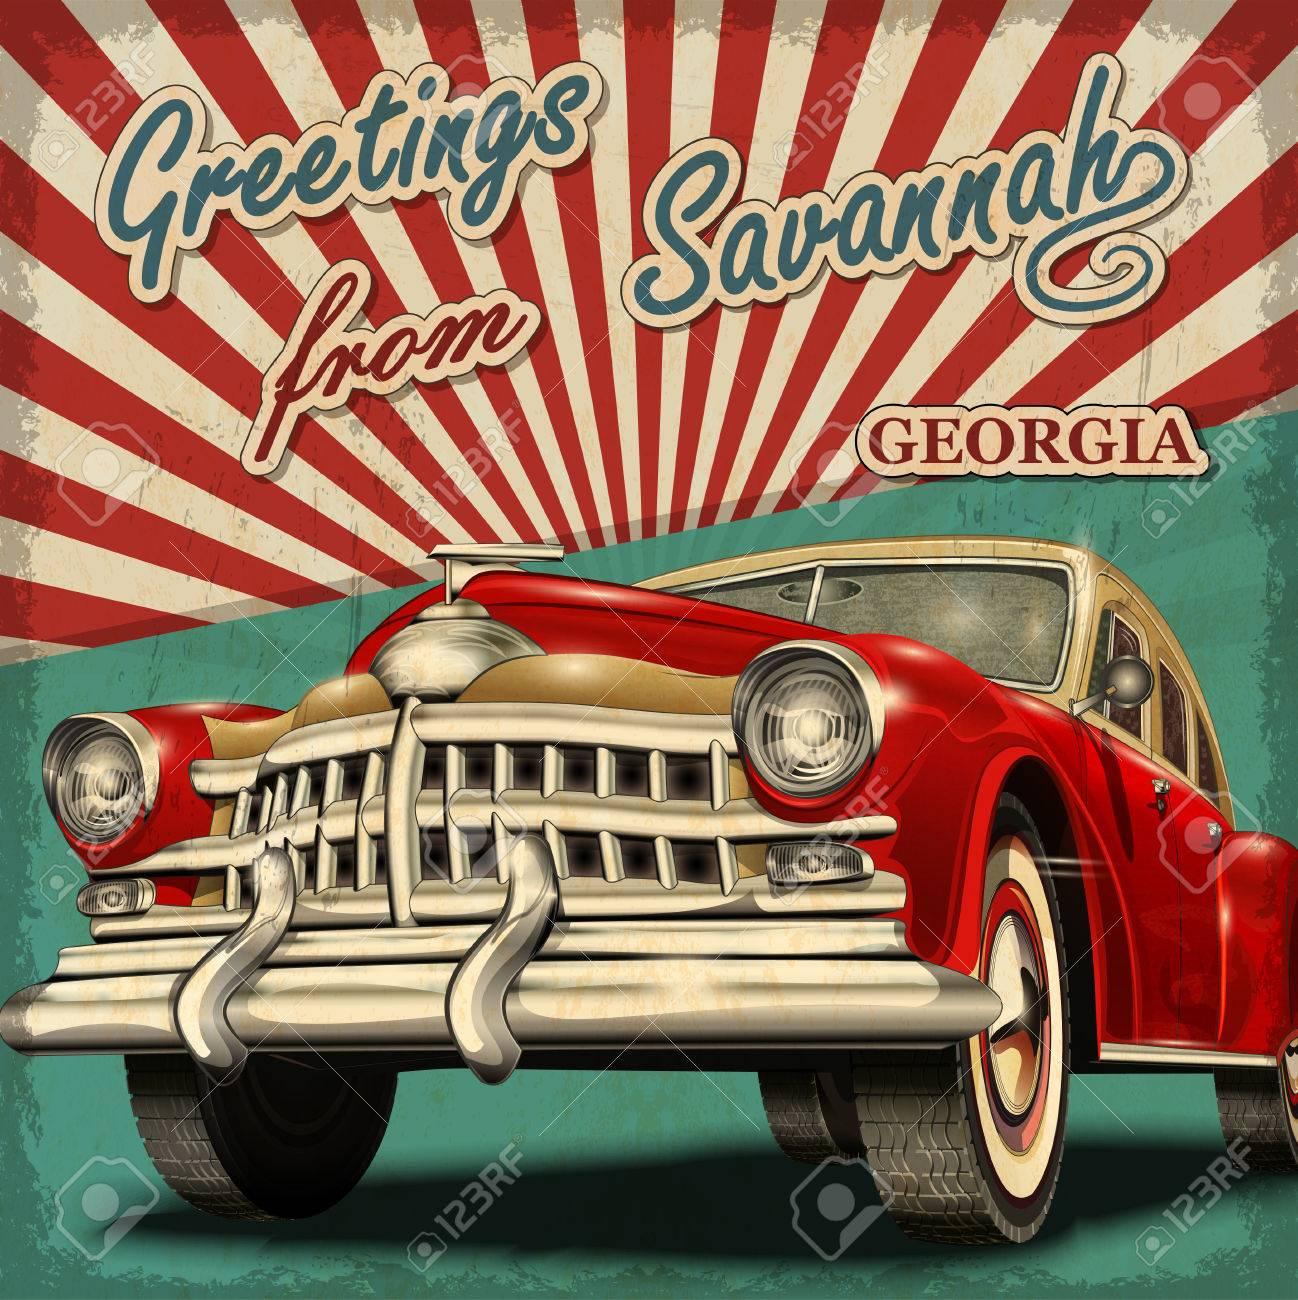 Vintage touristic greeting card with retro car Savannah Georgia